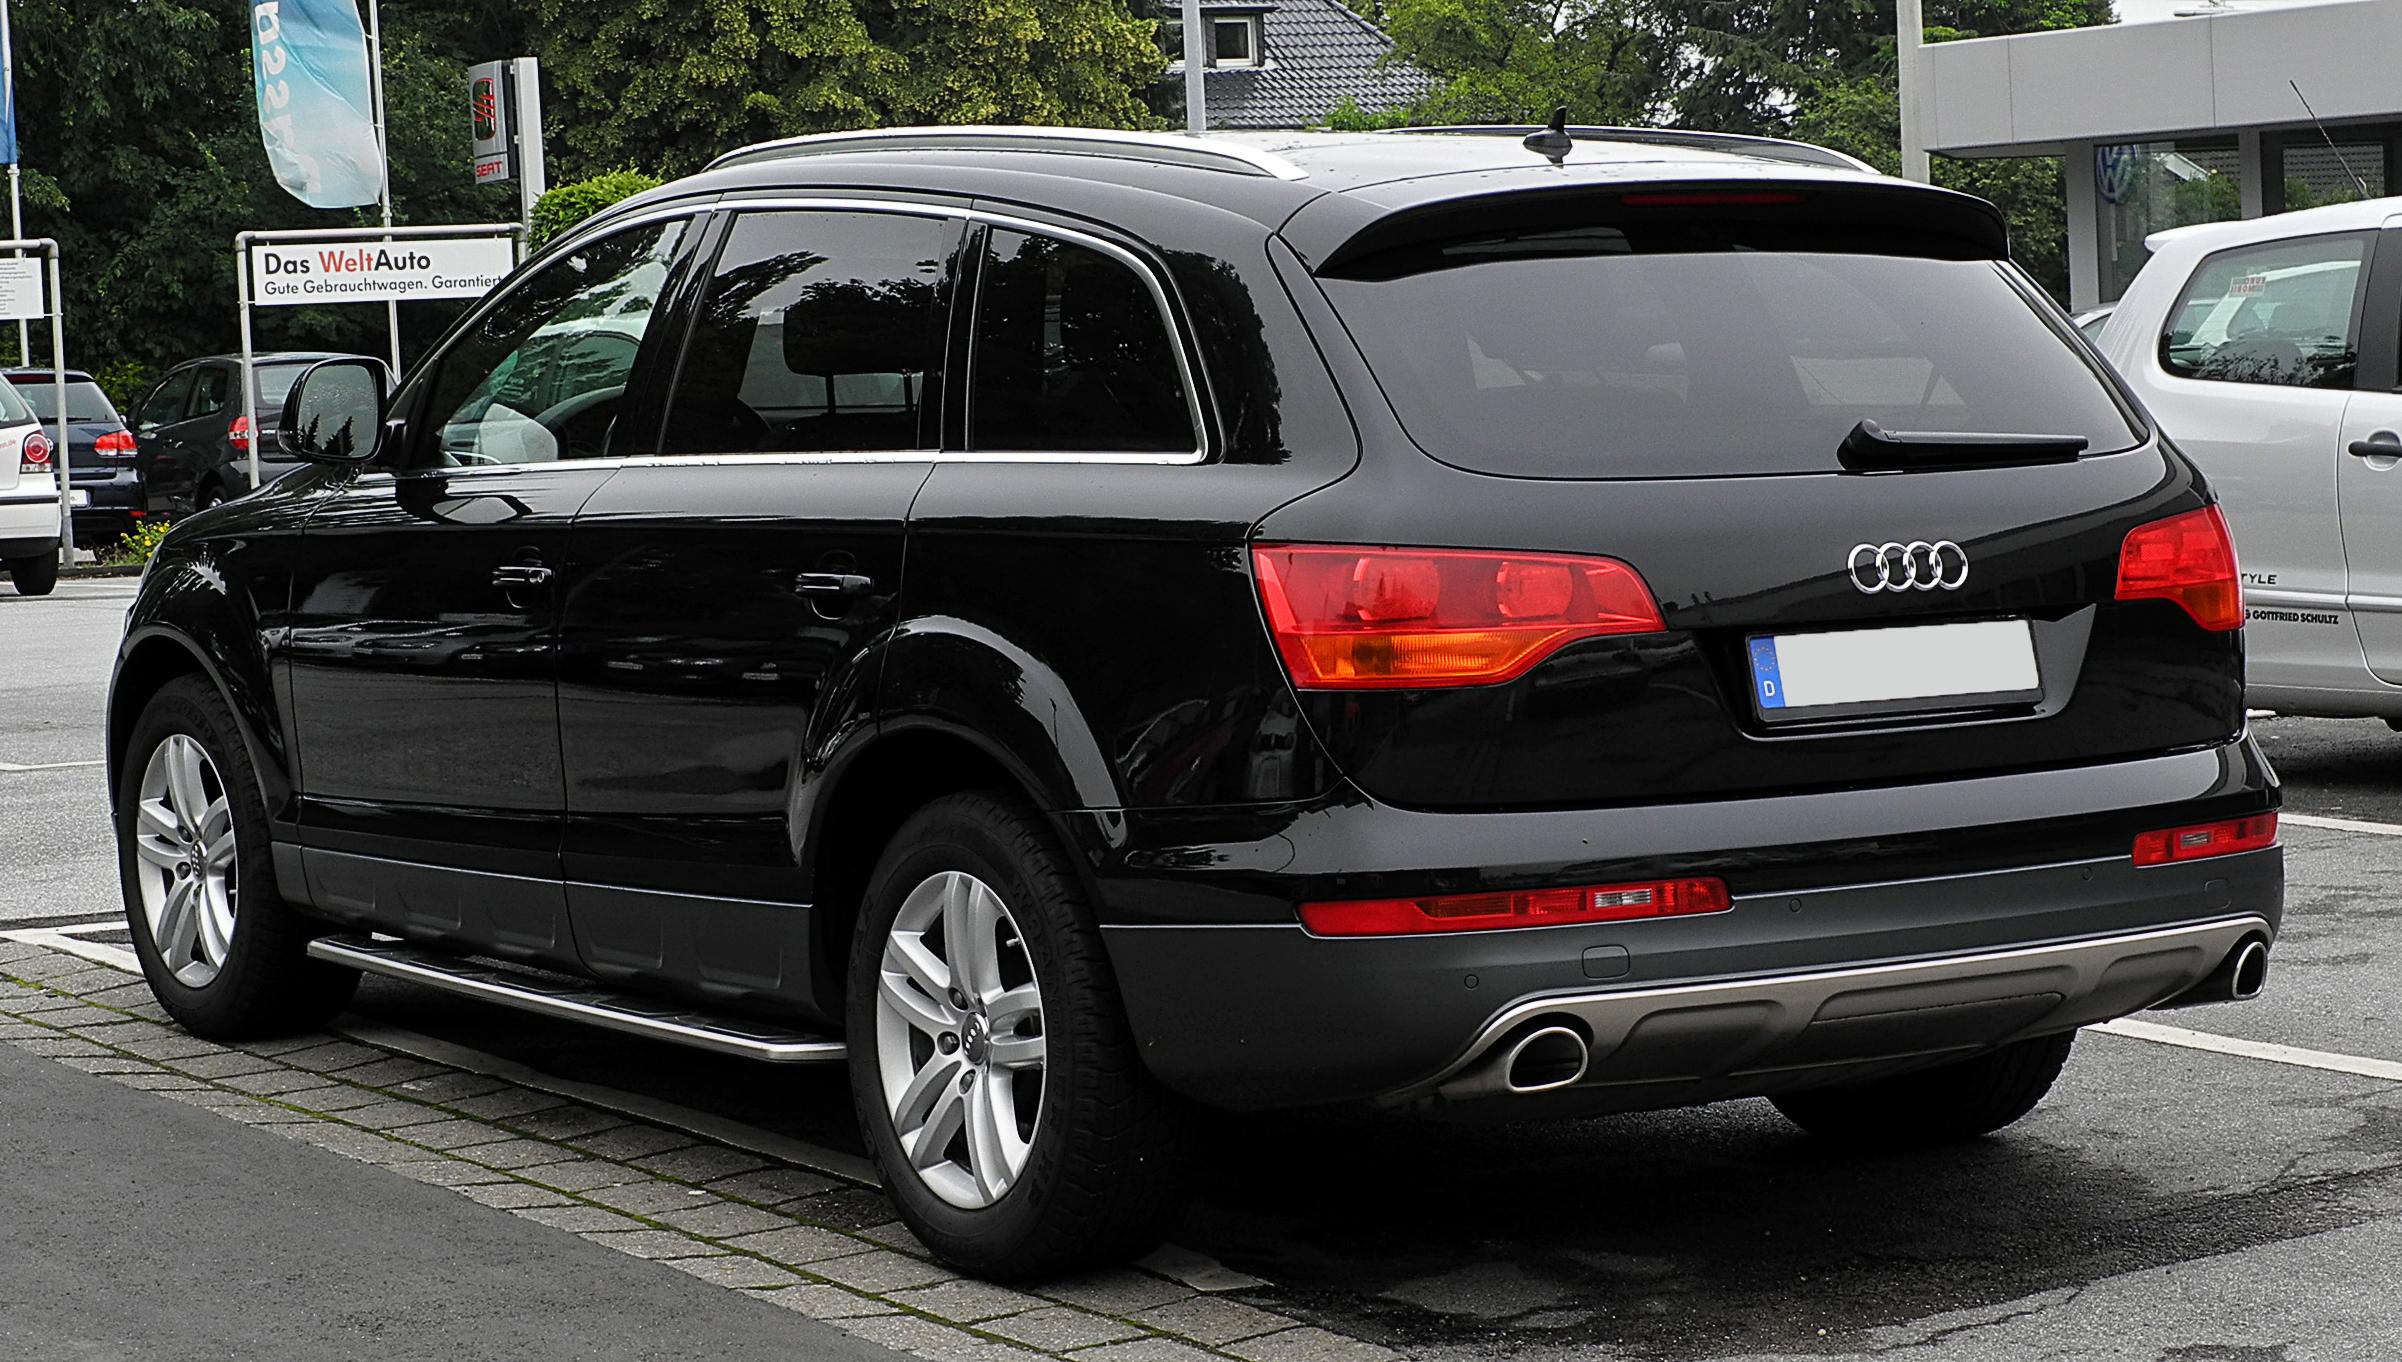 File:Audi Q7 – Heckansicht, 26. Juni 2011, Mettmann.jpg - Wikimedia